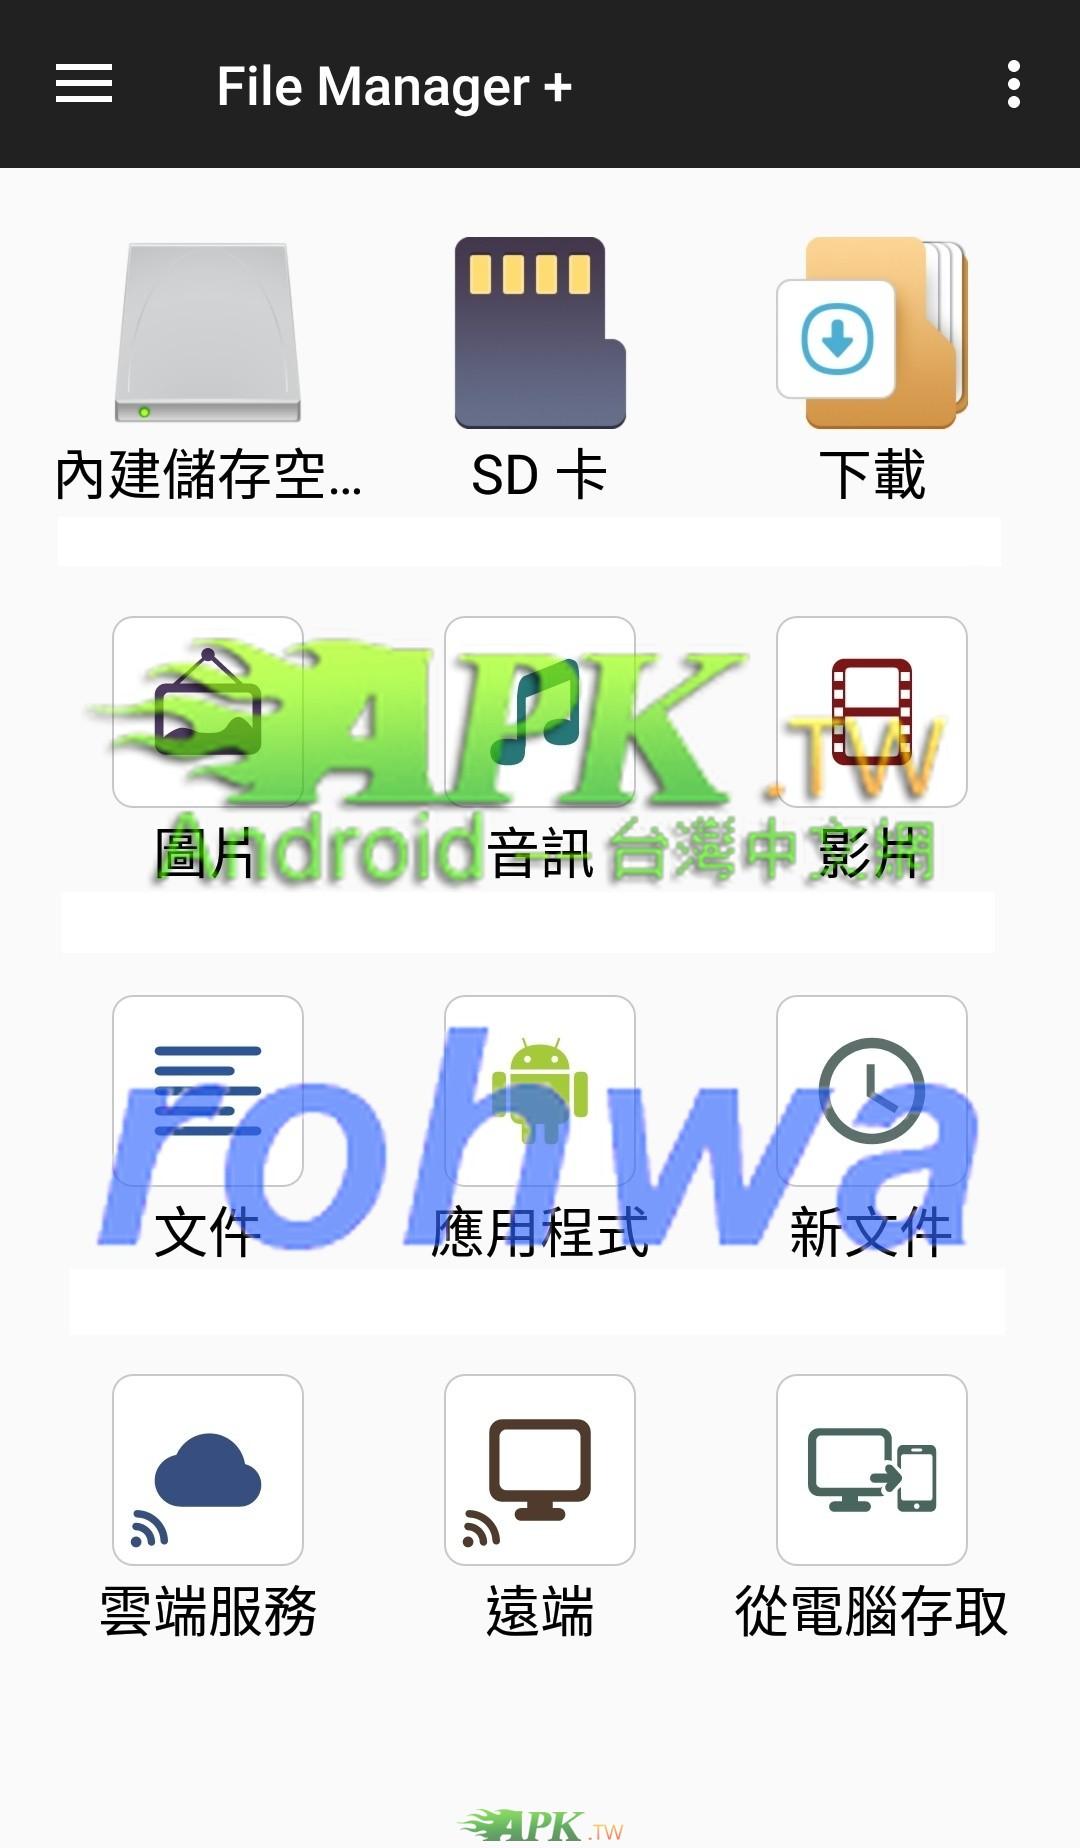 FileManager__1_.jpg